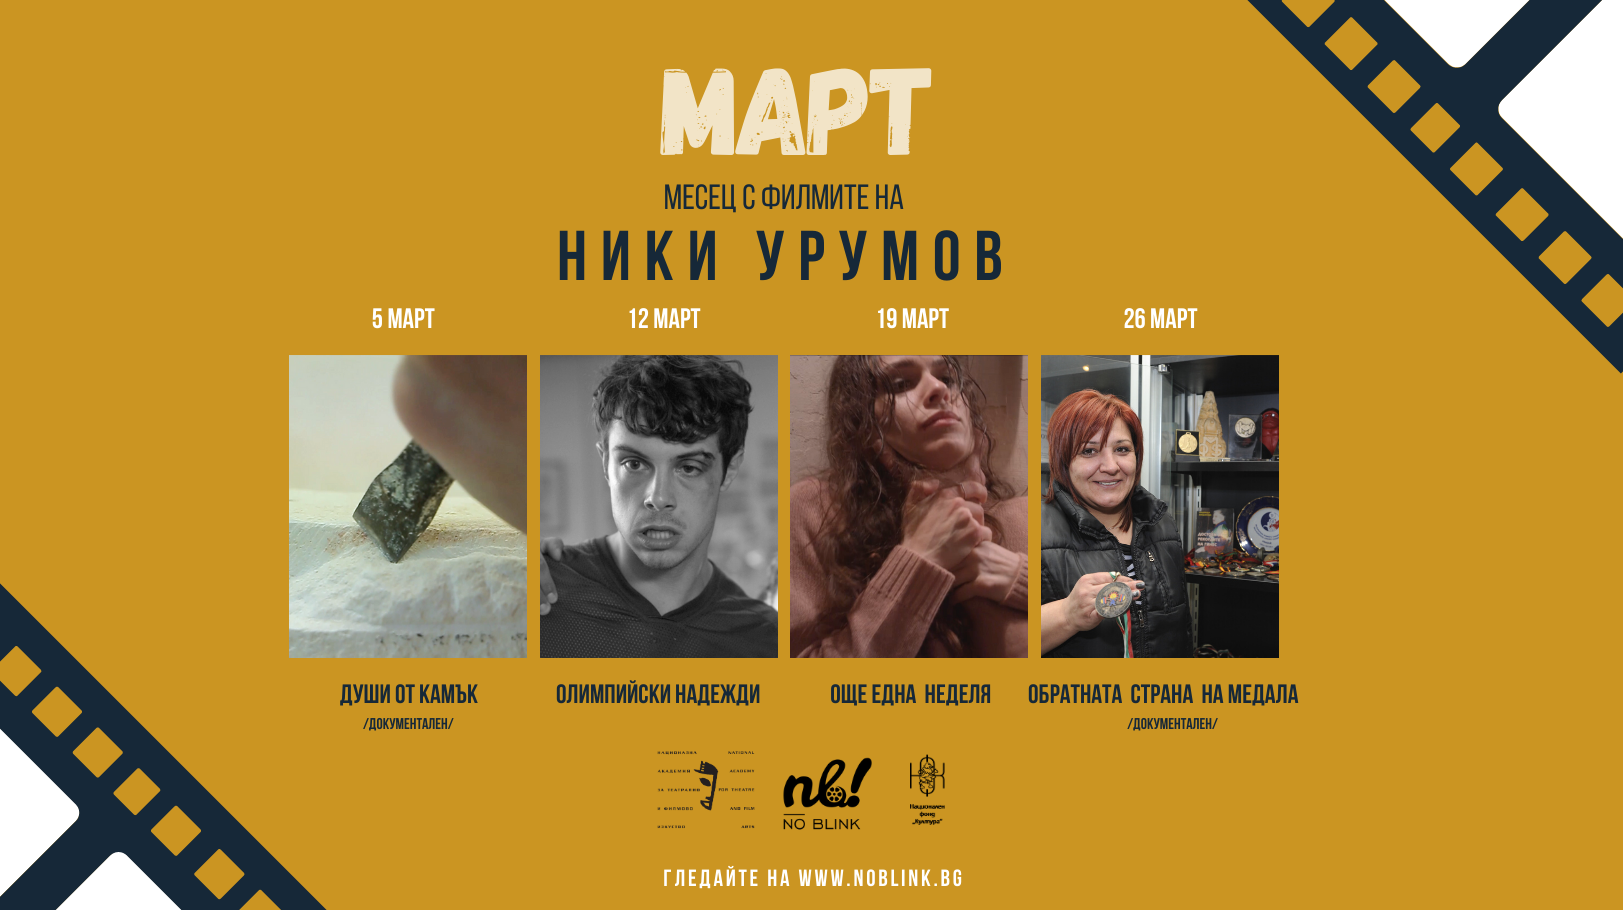 Месец с филмите на Ники Урумов в noblink.bg